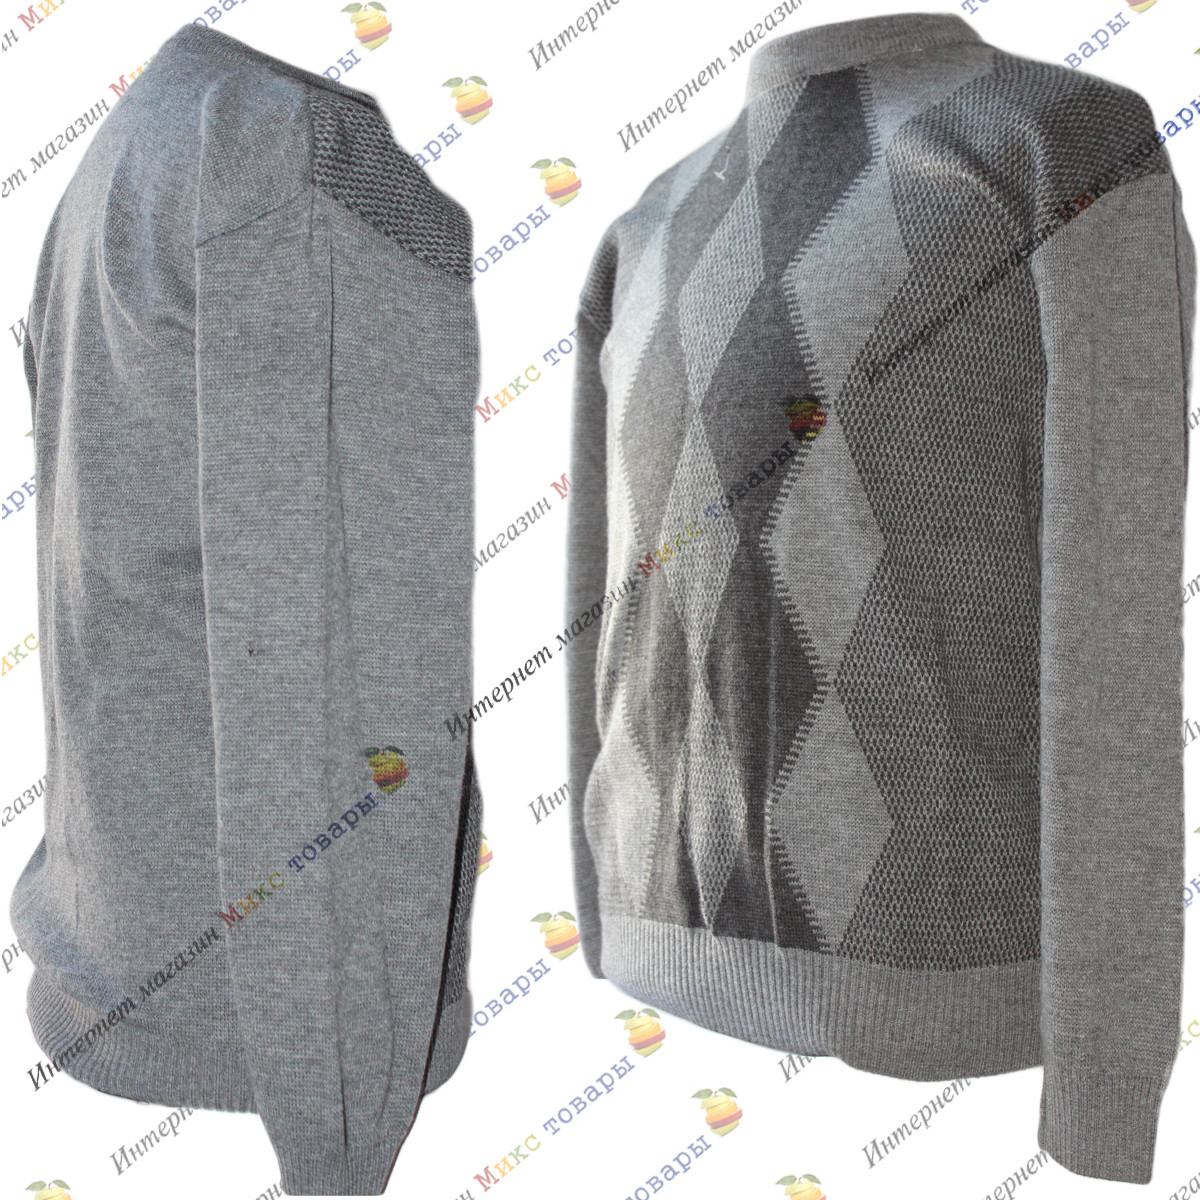 Мужские свитера с узором от 48 до 54 размера